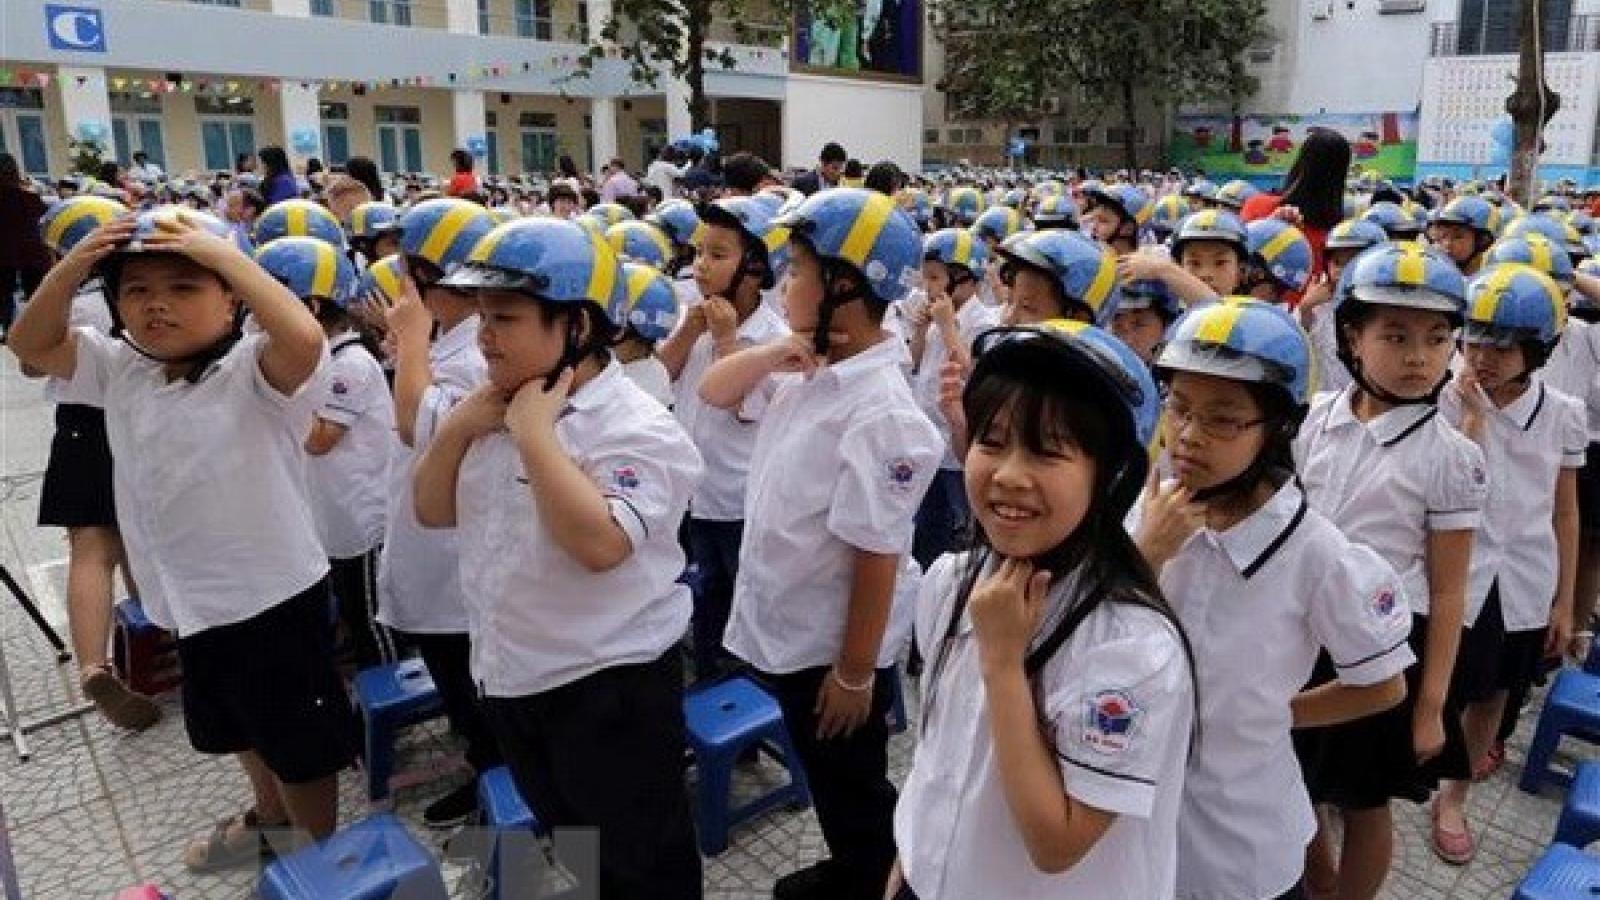 Programme encourages children to wear helmets